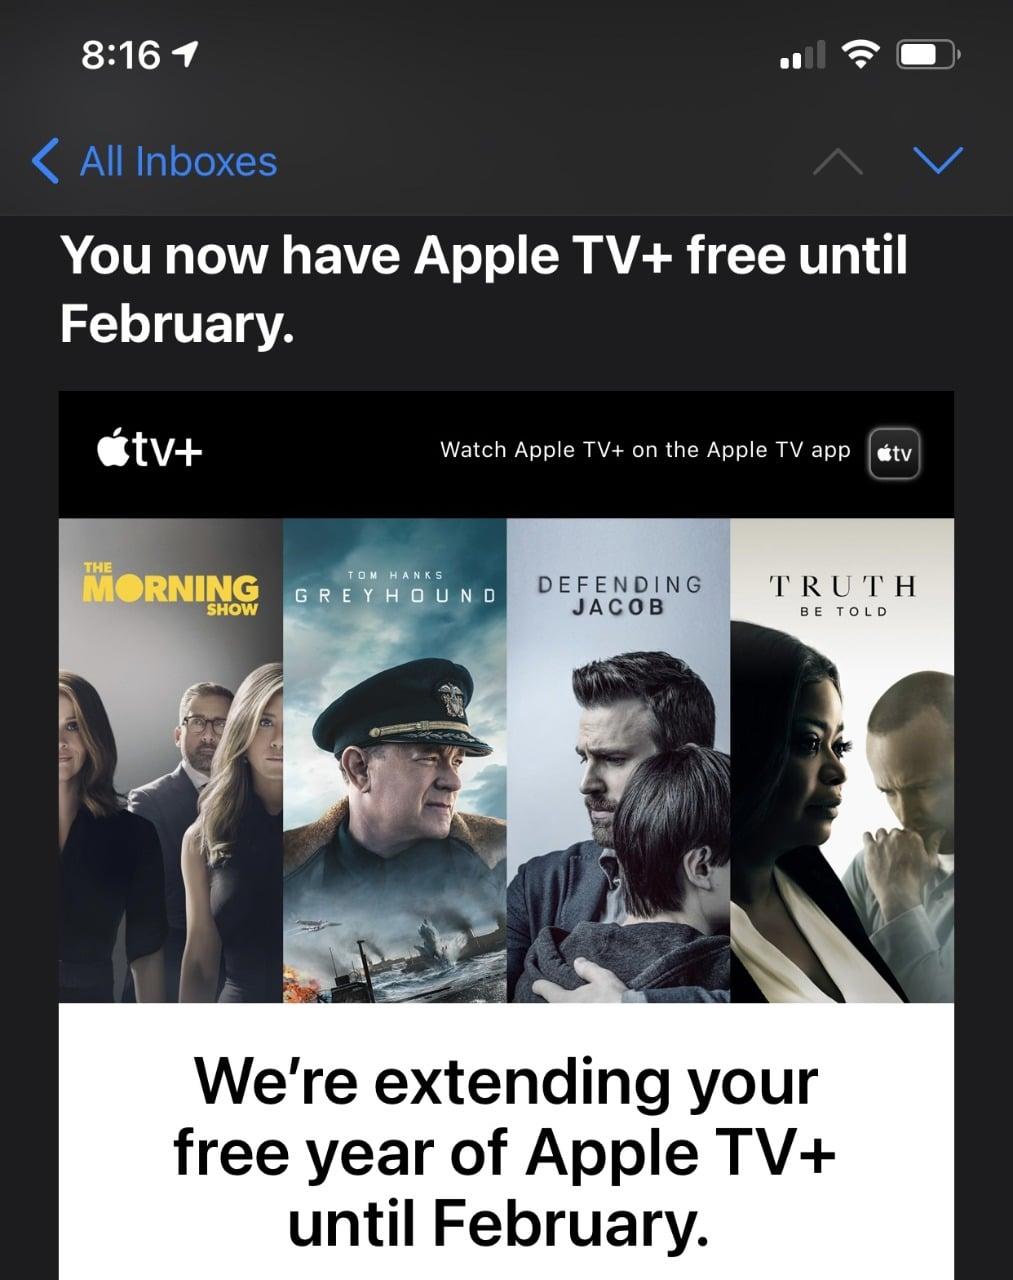 Email de alerta do Apple TV+